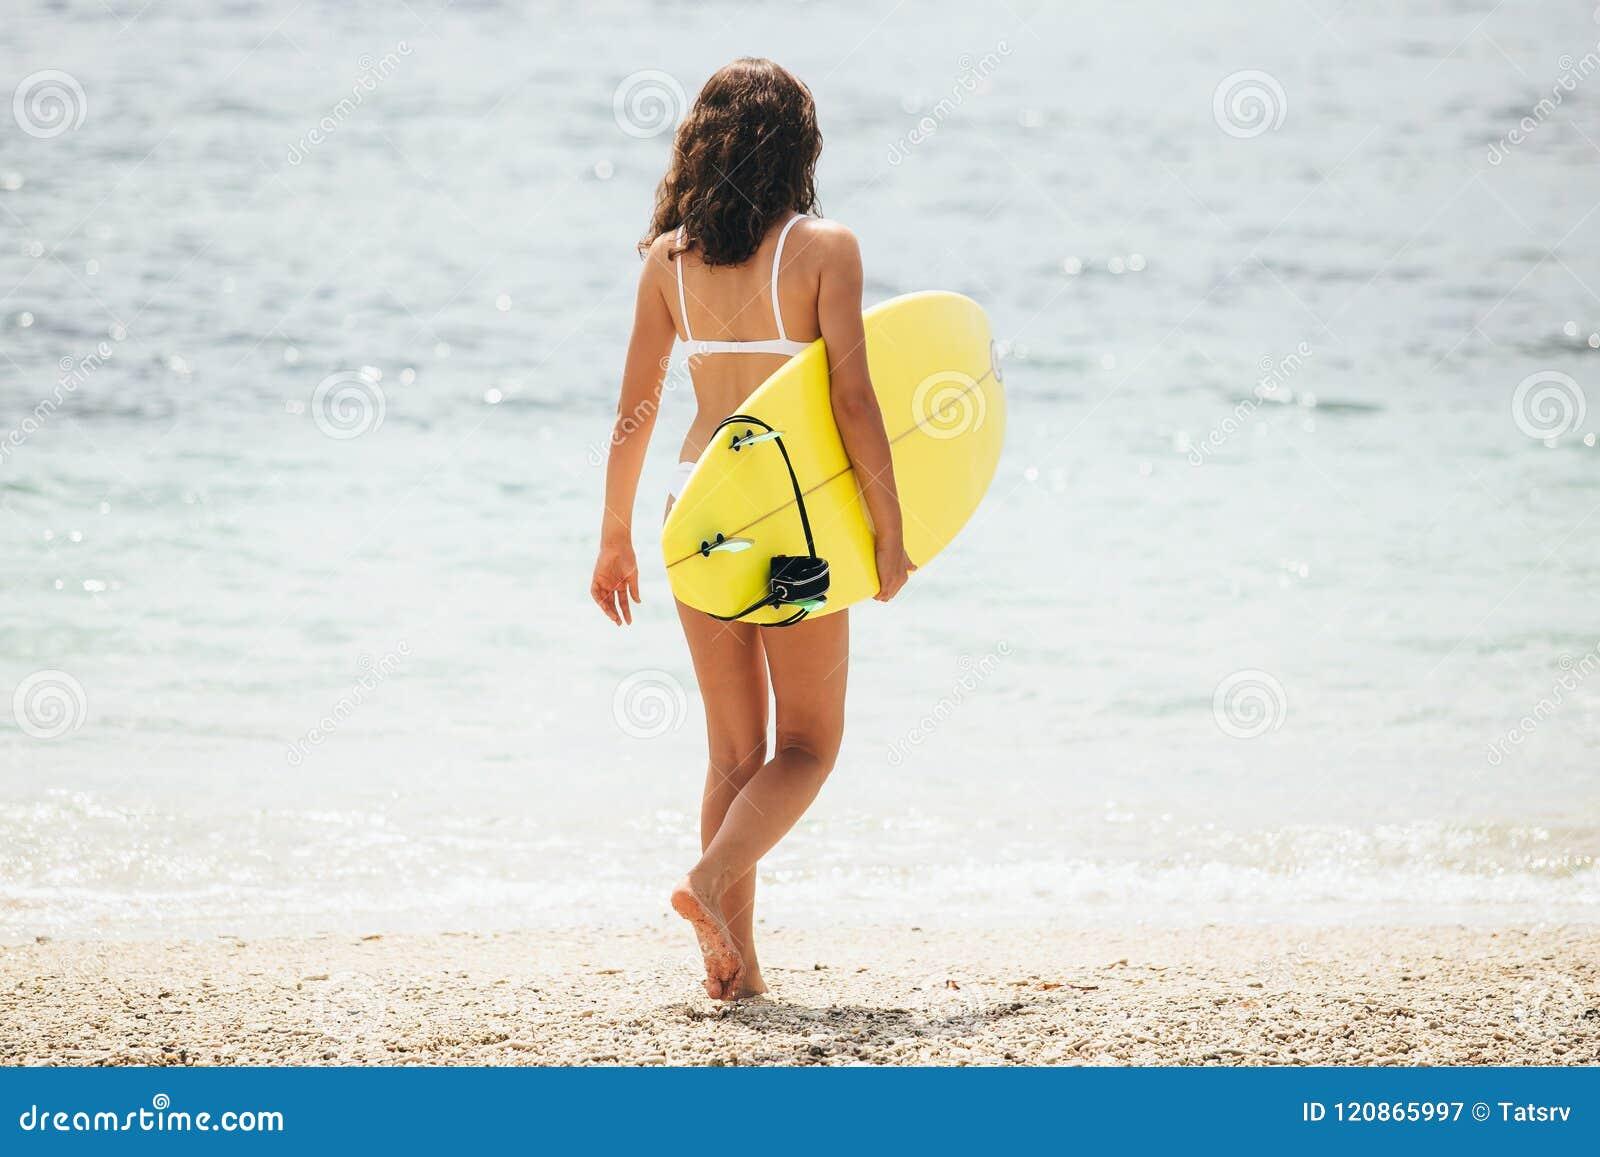 Surfendes Surferfrauenmädchen, das Surfbrett halten geht Kaanapali-Strand, Maui, Hawaii, USA